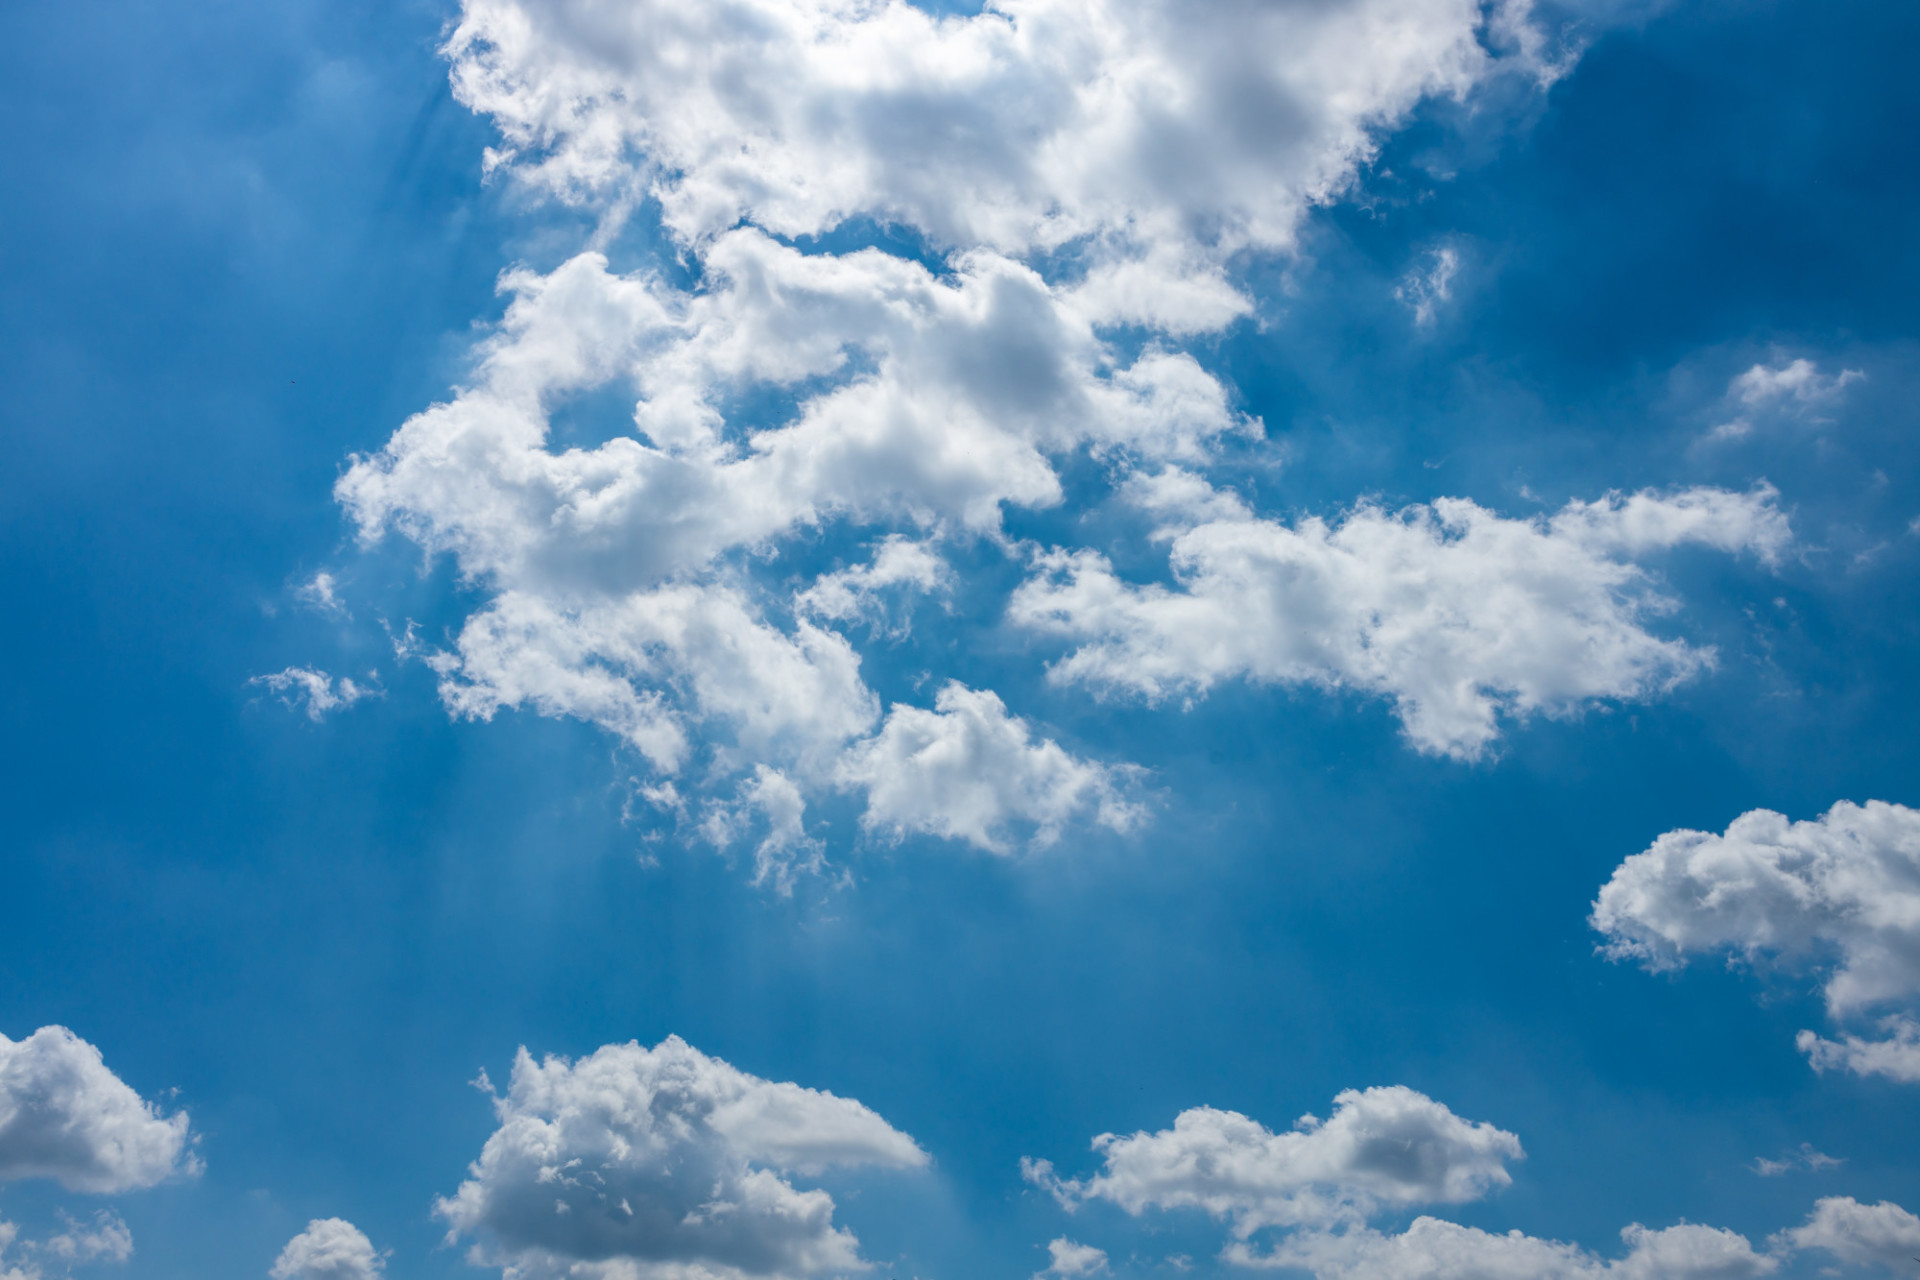 Light breaks through the clouds Sky